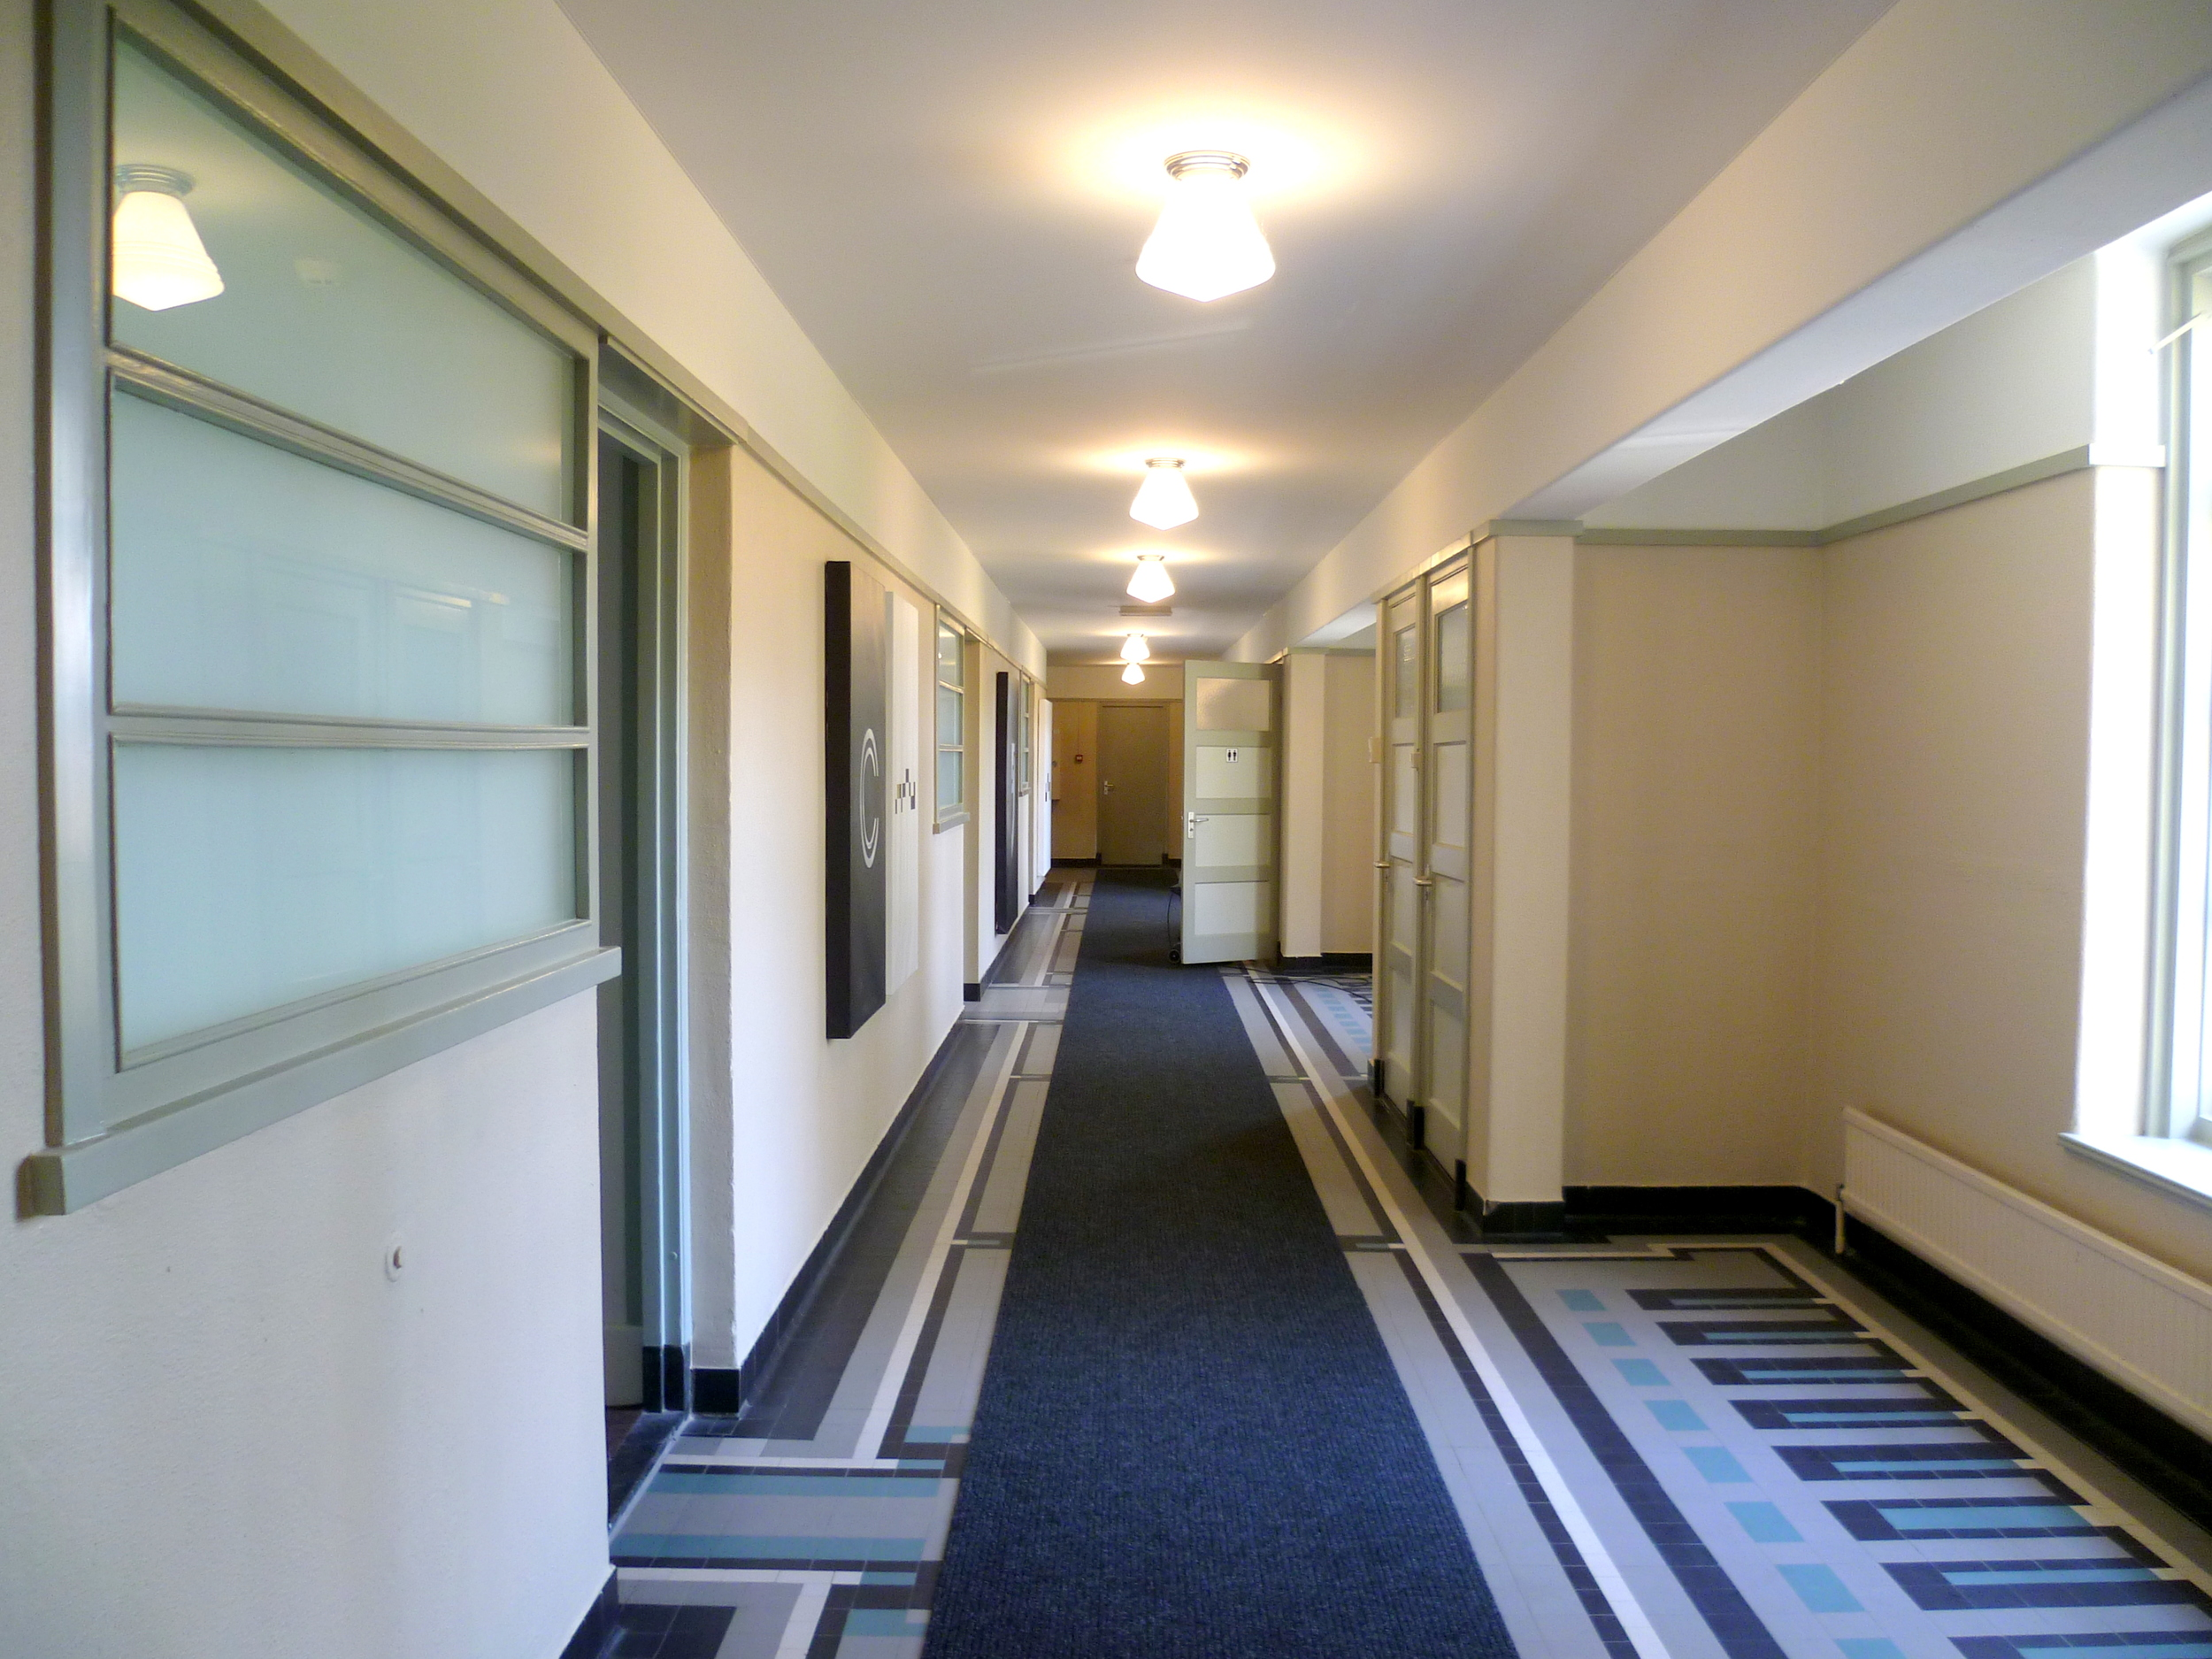 College Hotel gangruimte